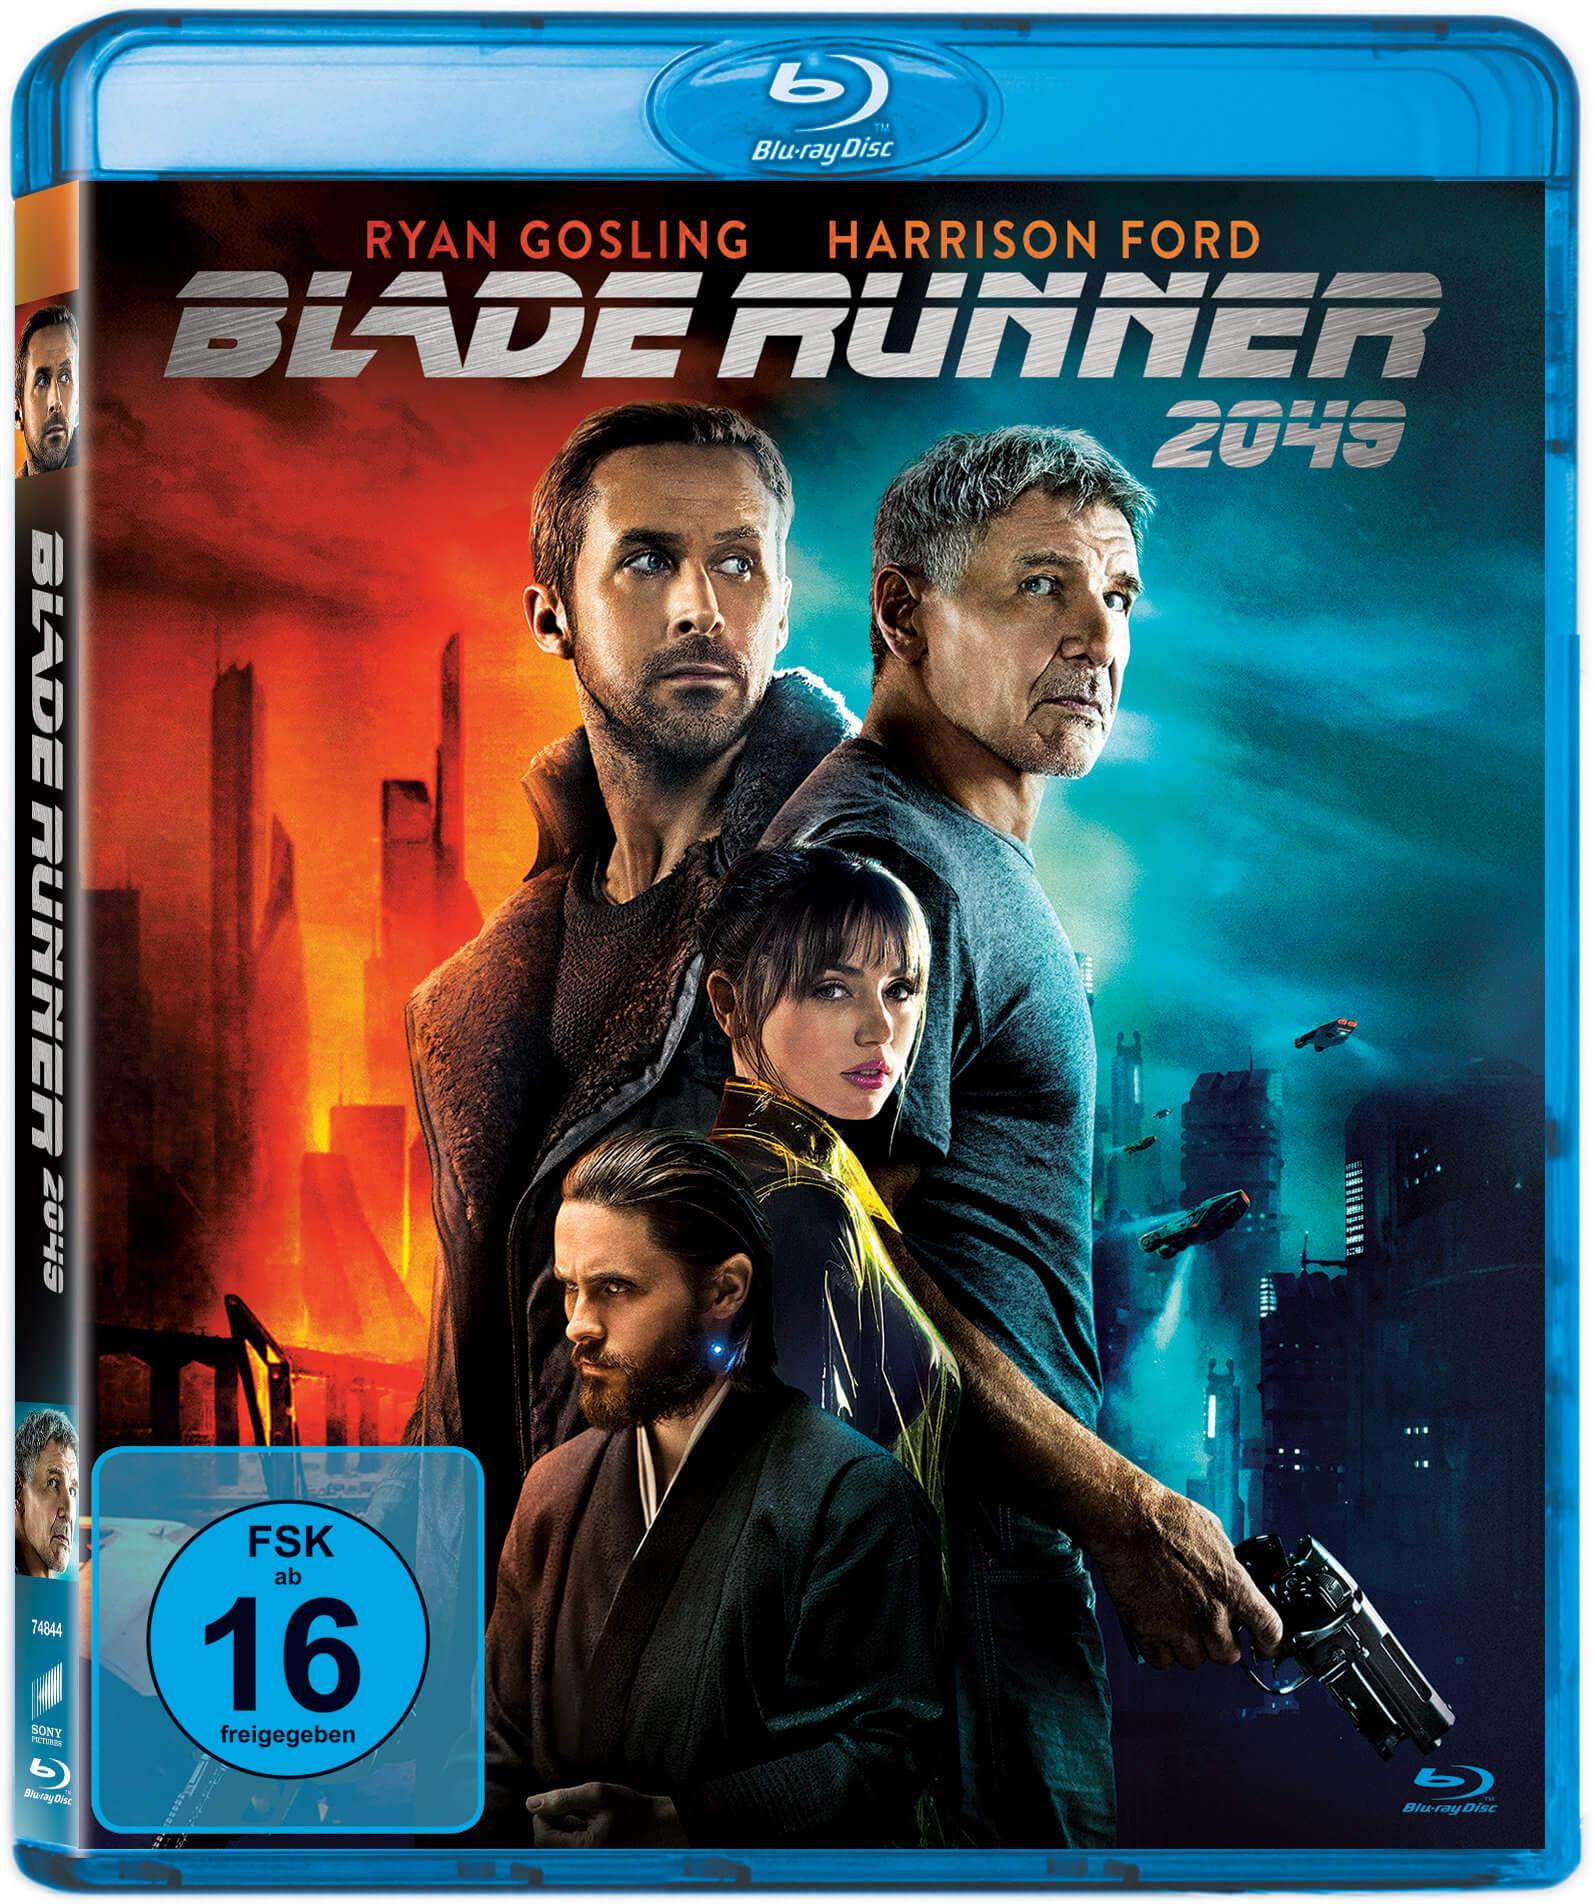 Blade Runner 2049 BD